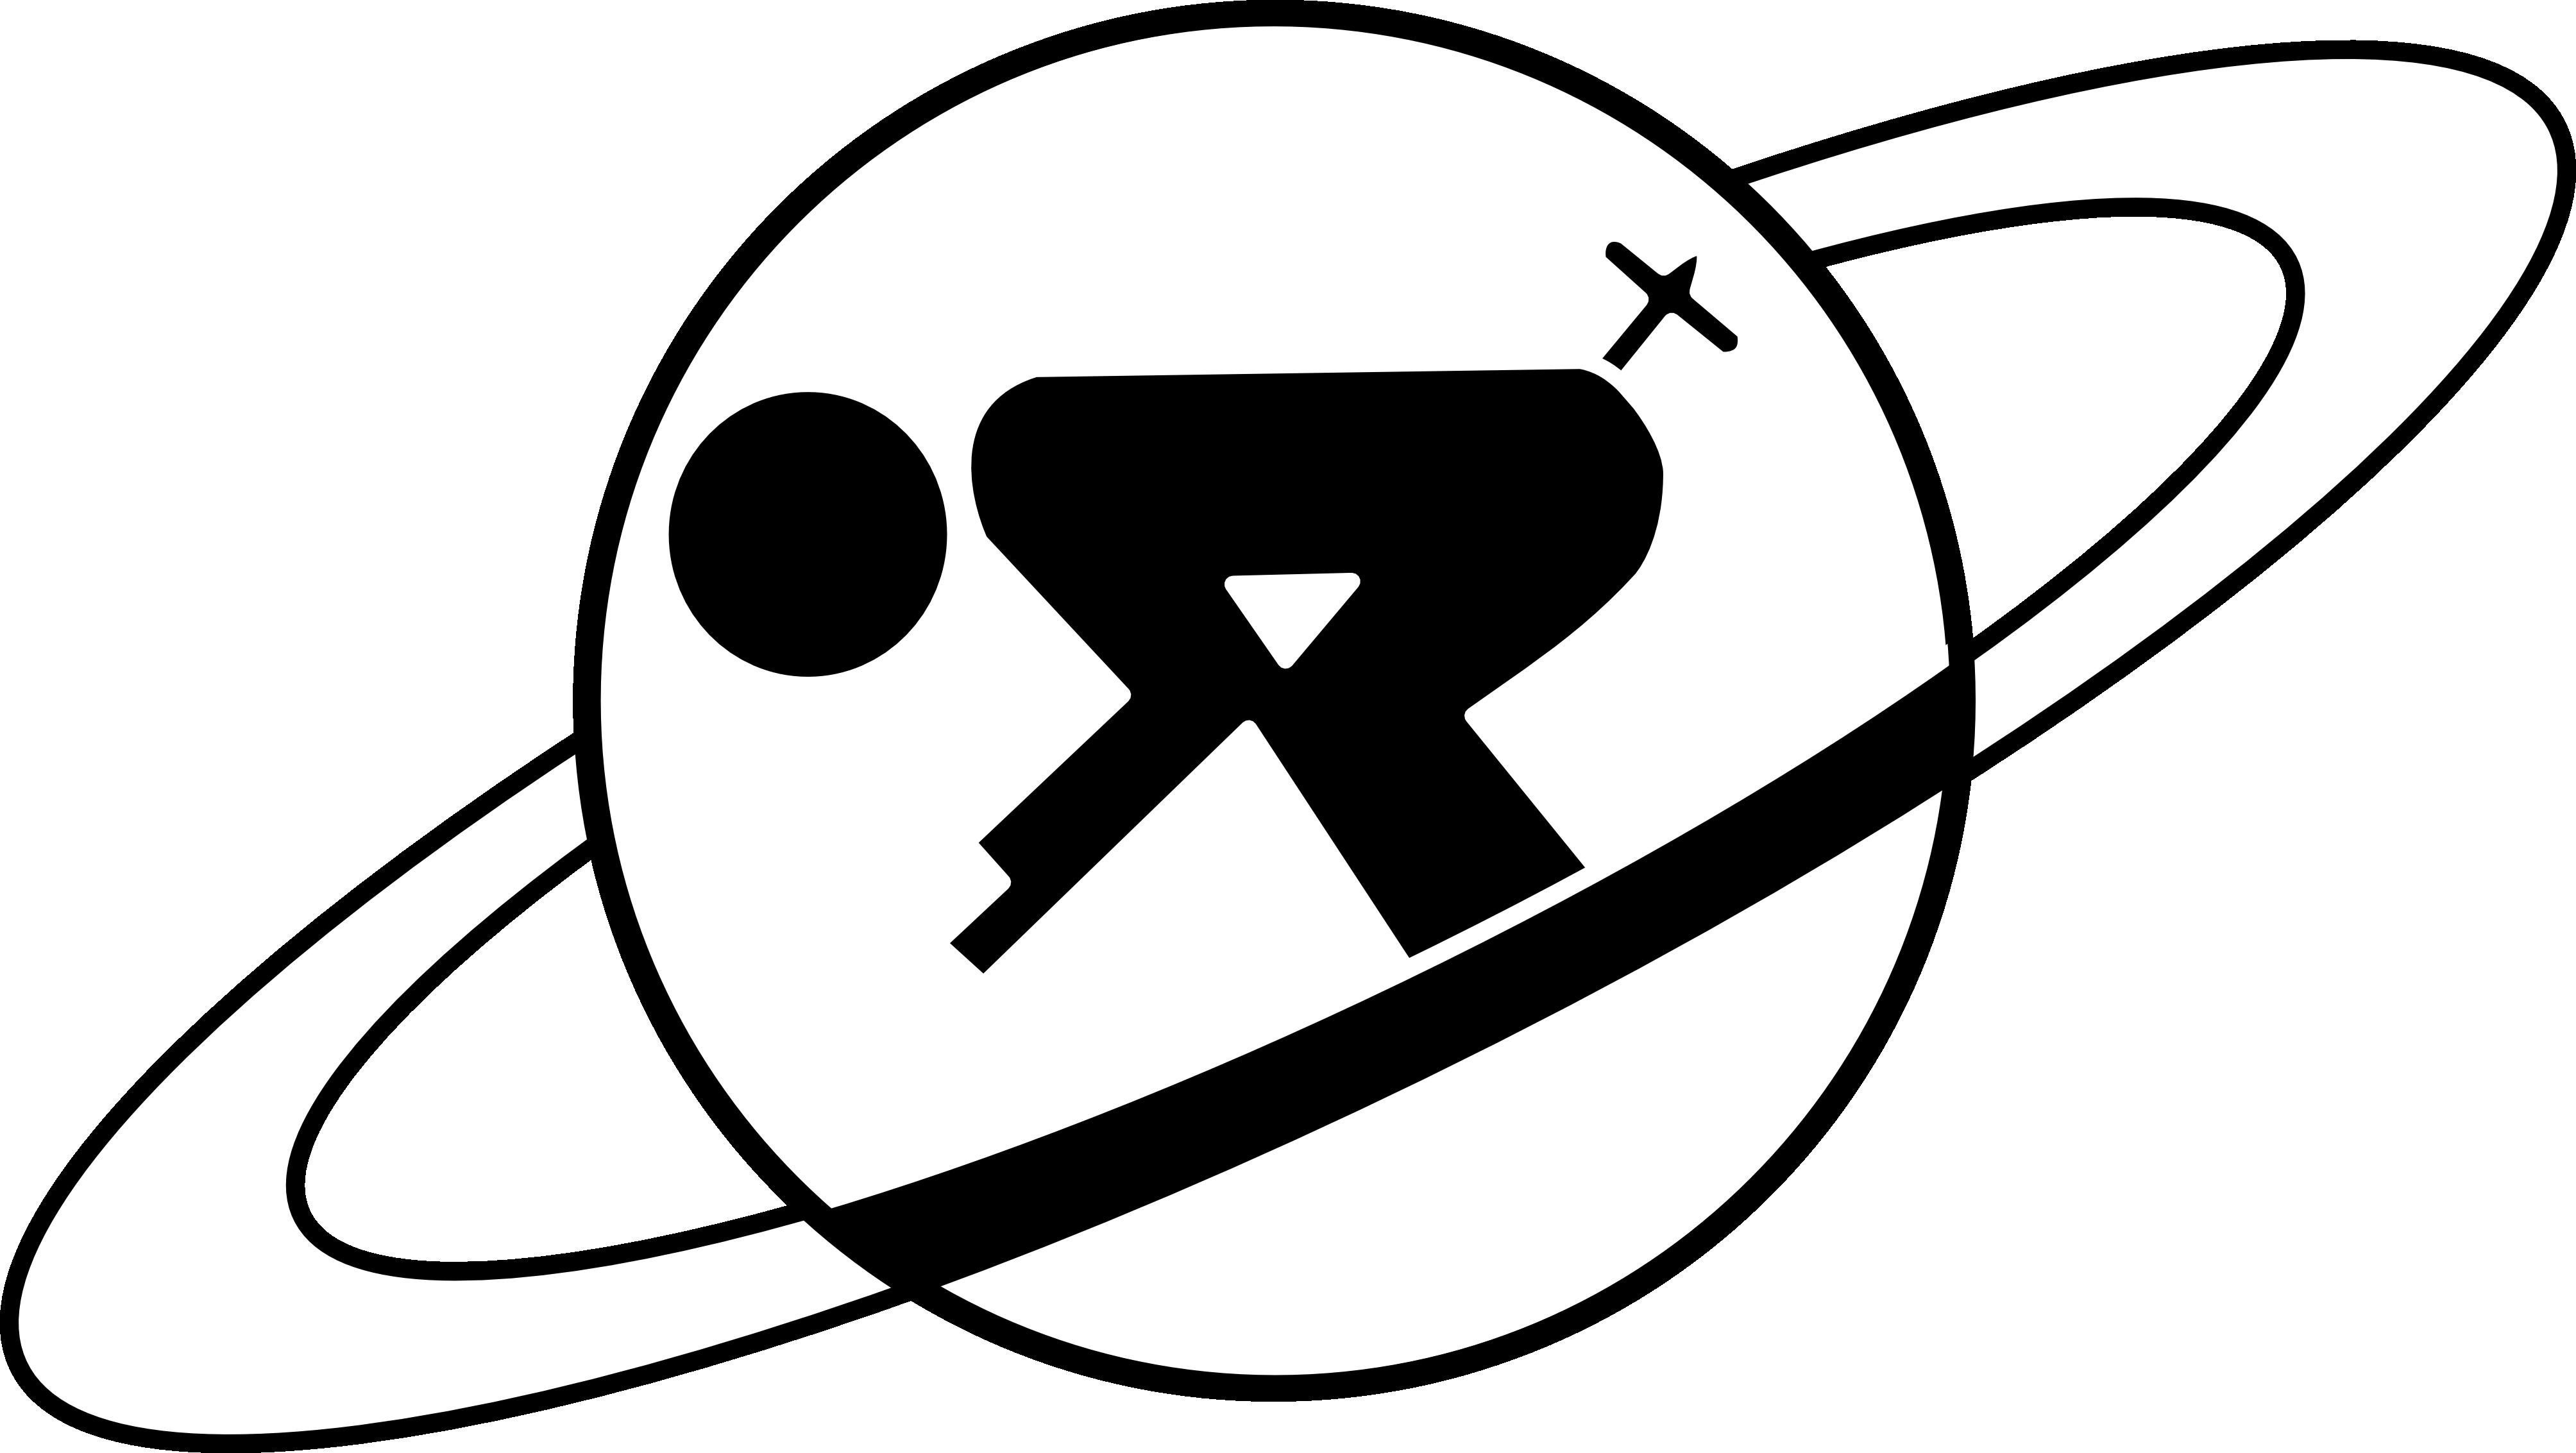 Book club clipart black and white clip art transparent download Club Logos | Lewis Ski Club clip art transparent download